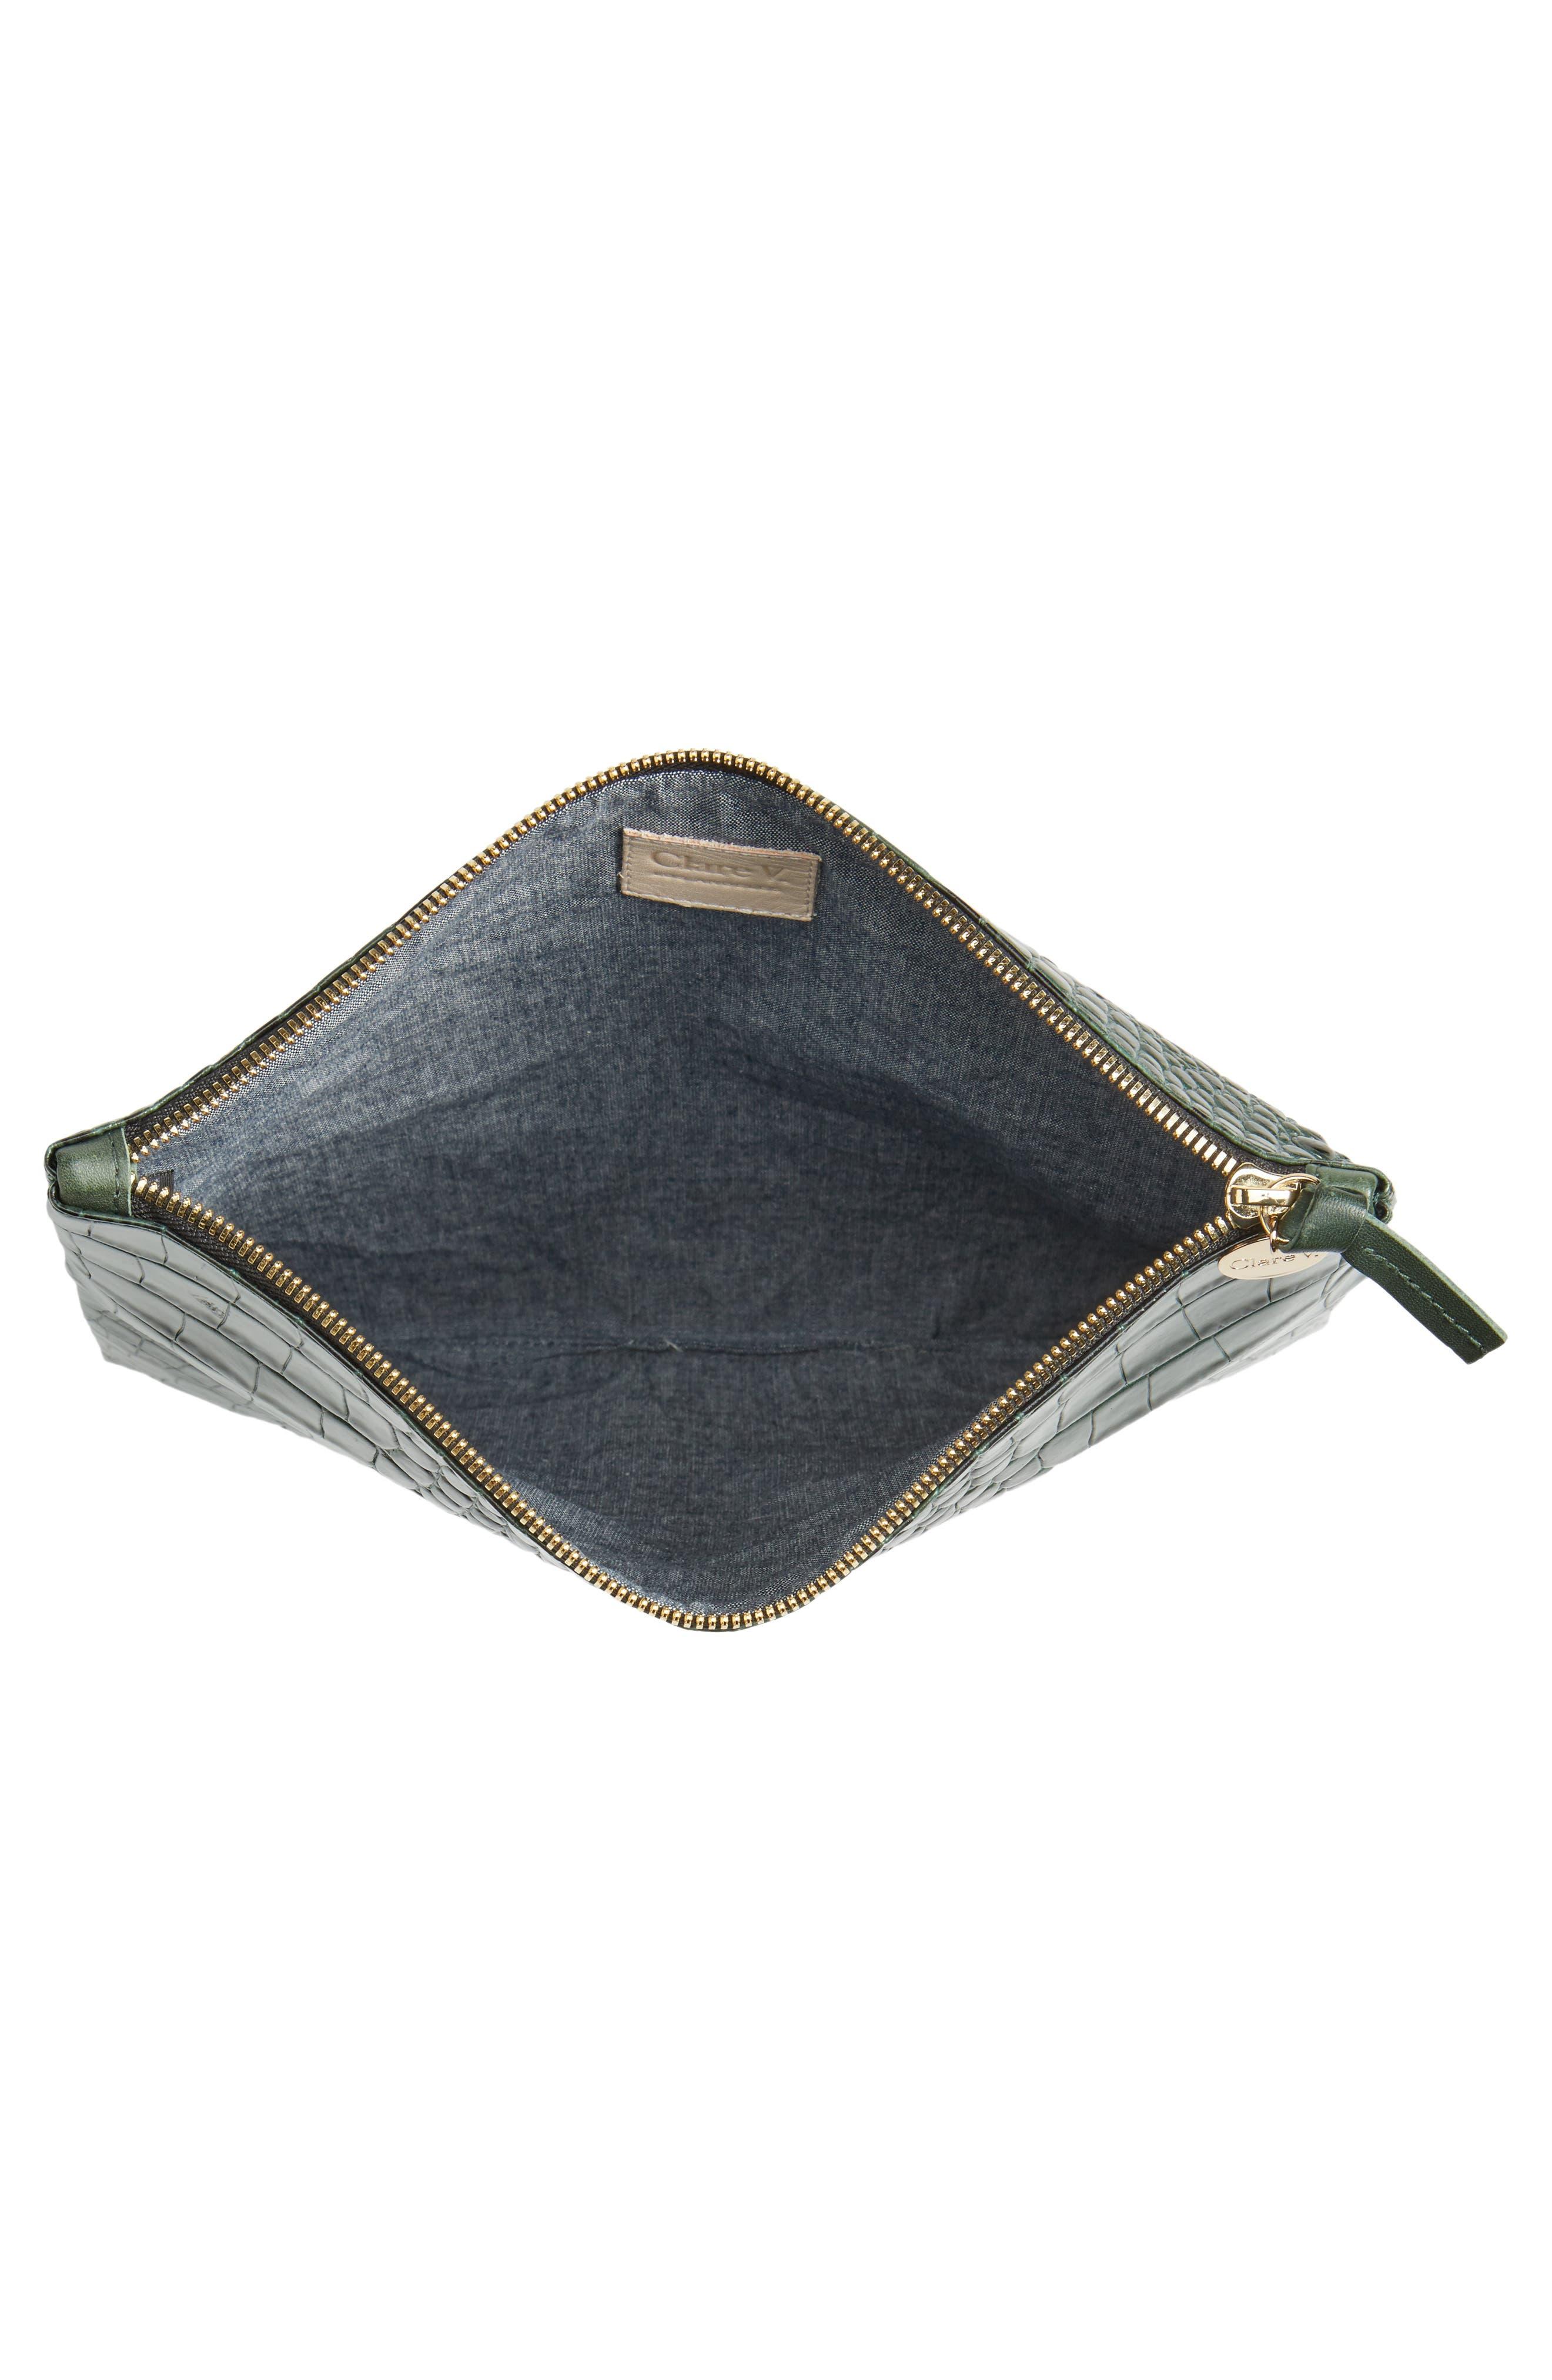 Alternate Image 3  - Clare V. Croc Embossed Leather Foldover Clutch